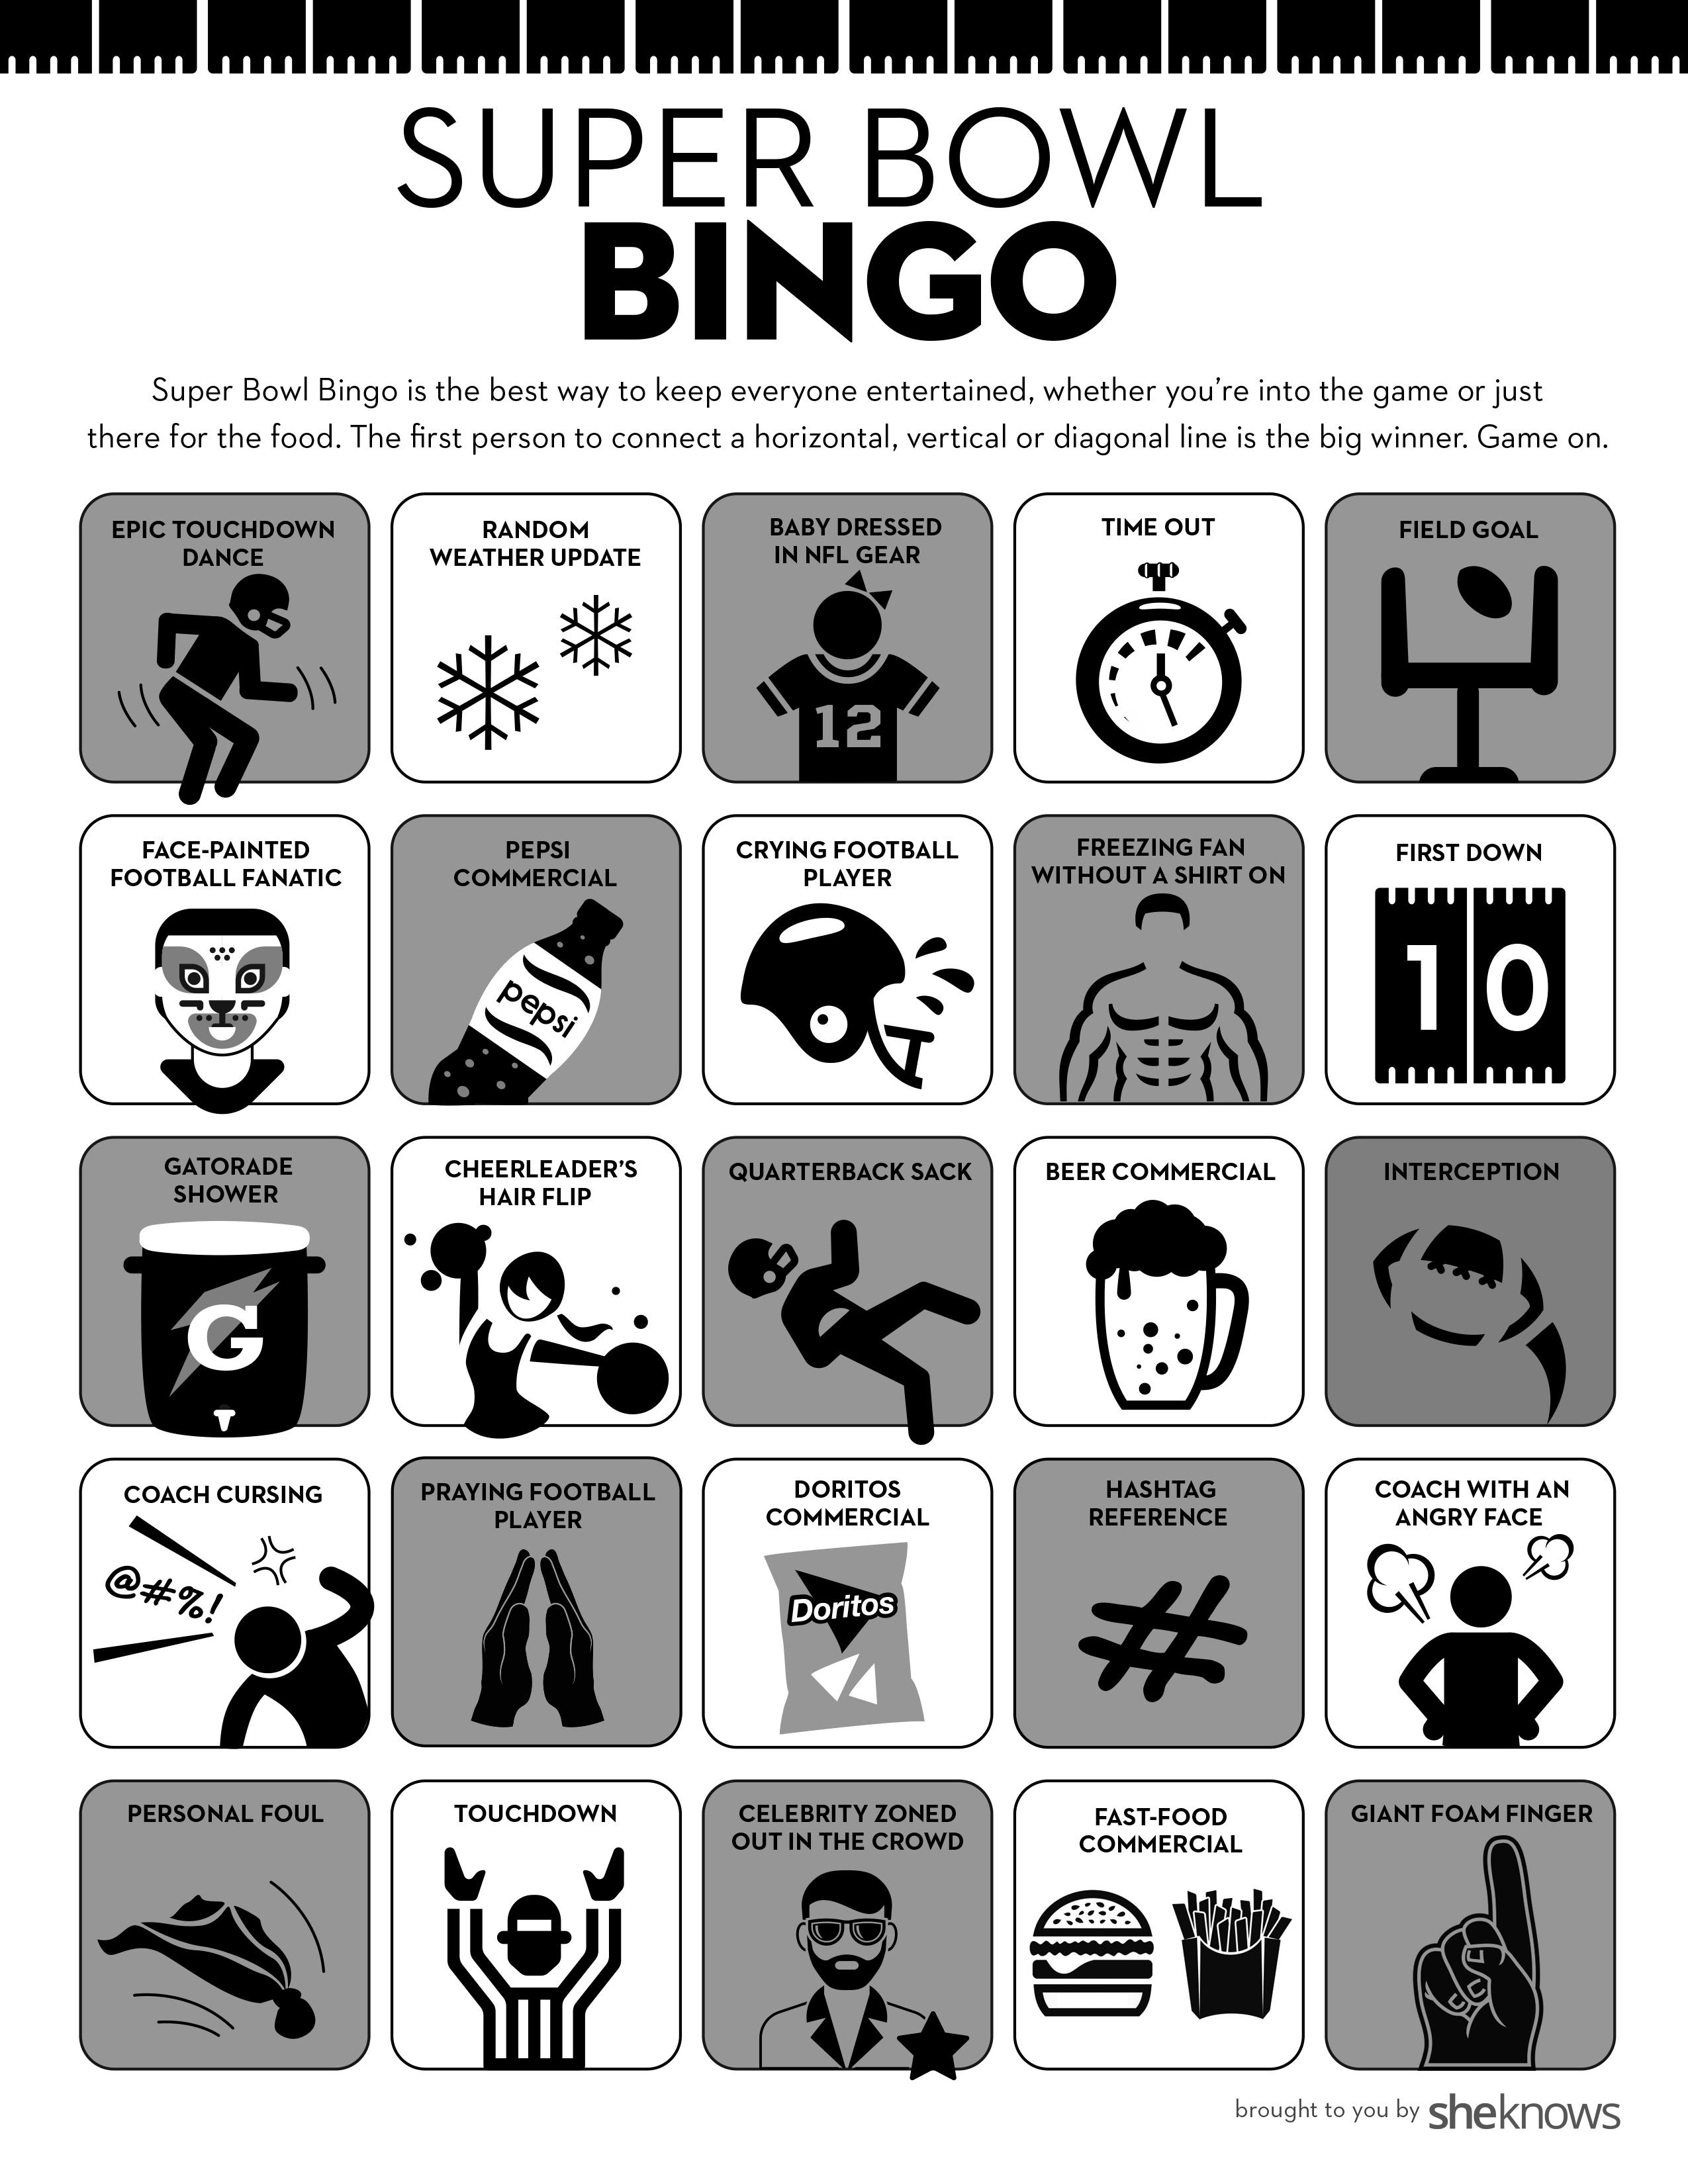 superbowl_bingo3.jpg